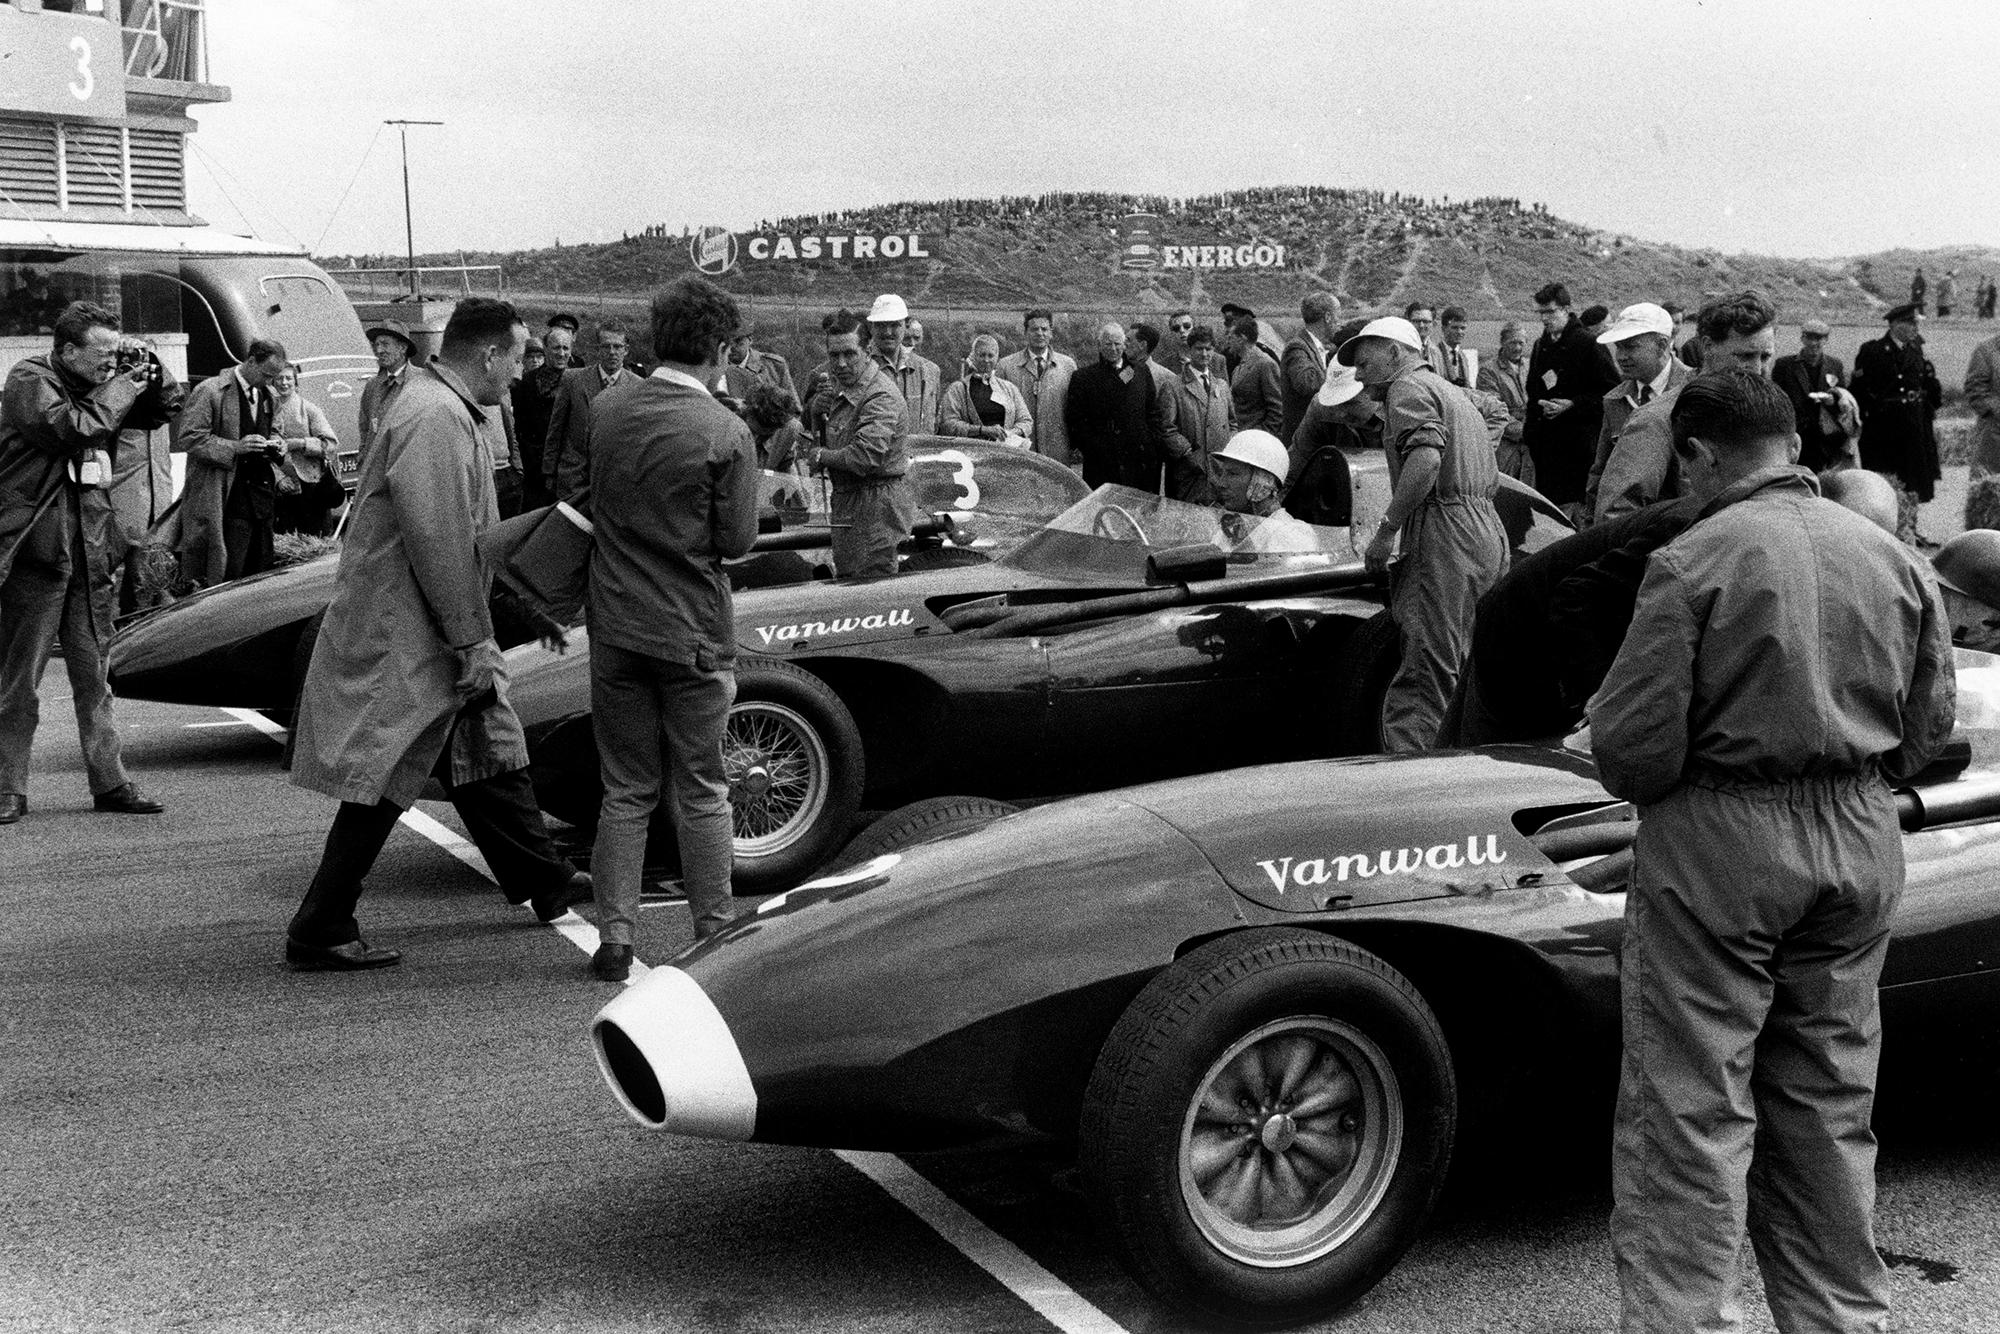 Vanwall front row: Tony Brooks, Vanwall VW7, Stirling Moss, Vanwall VW10, and Stuart Lewis-Evans, Vanwall VW5, on the grid before the start of the race.